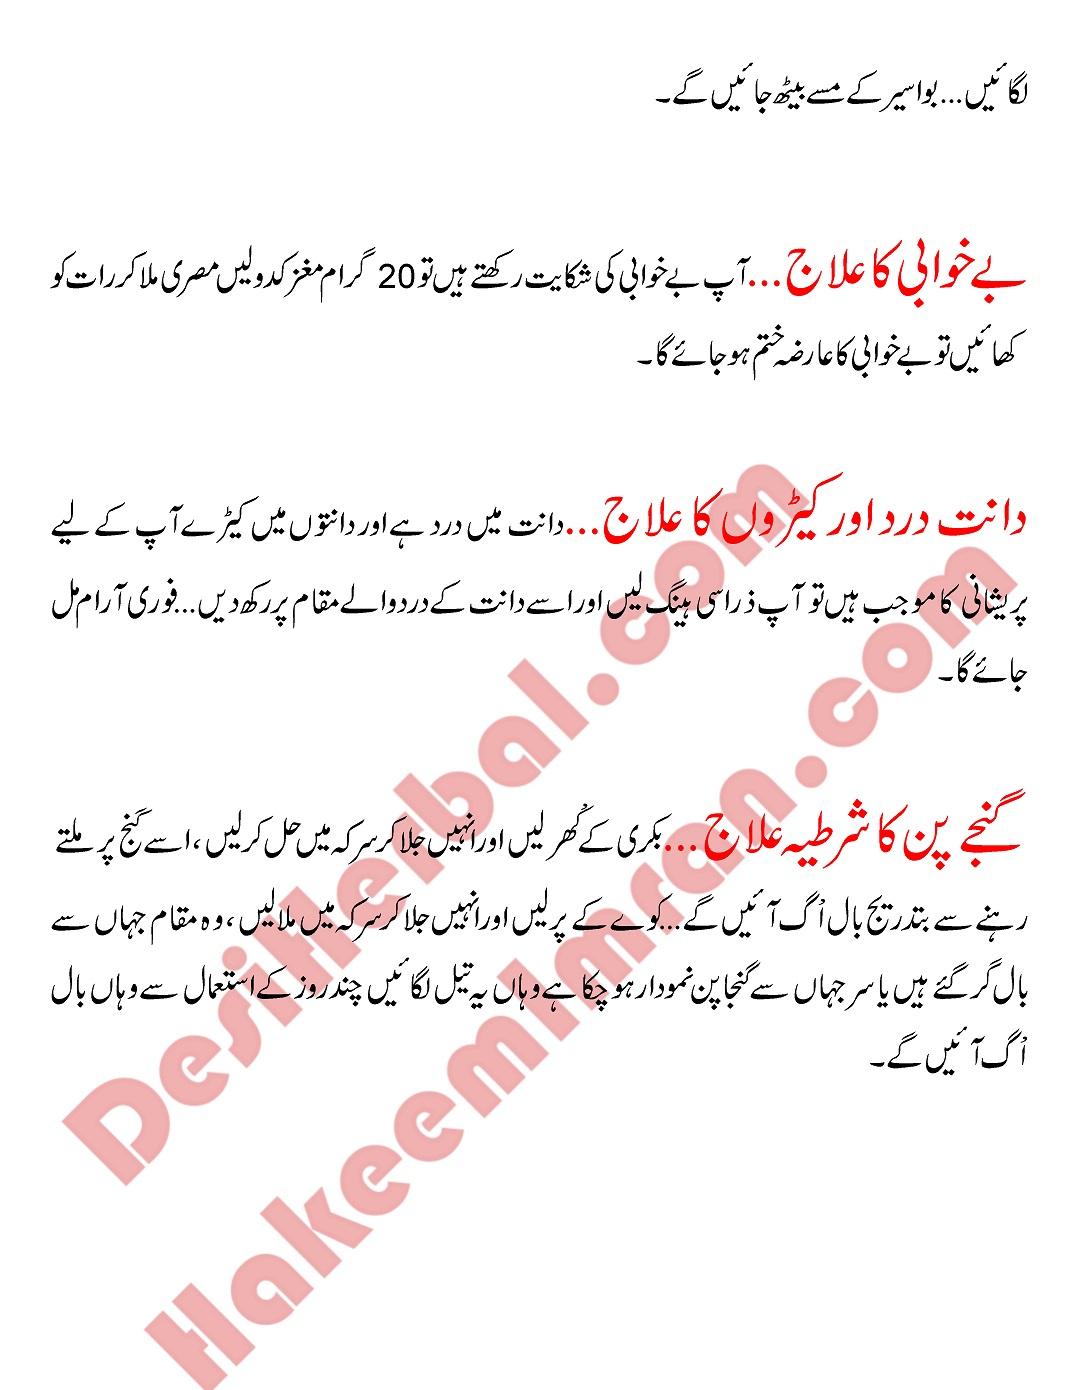 Desi Totkay In Urdu Mukhtalif Bimarian Or Un Ka Ilaj Desi Herbal